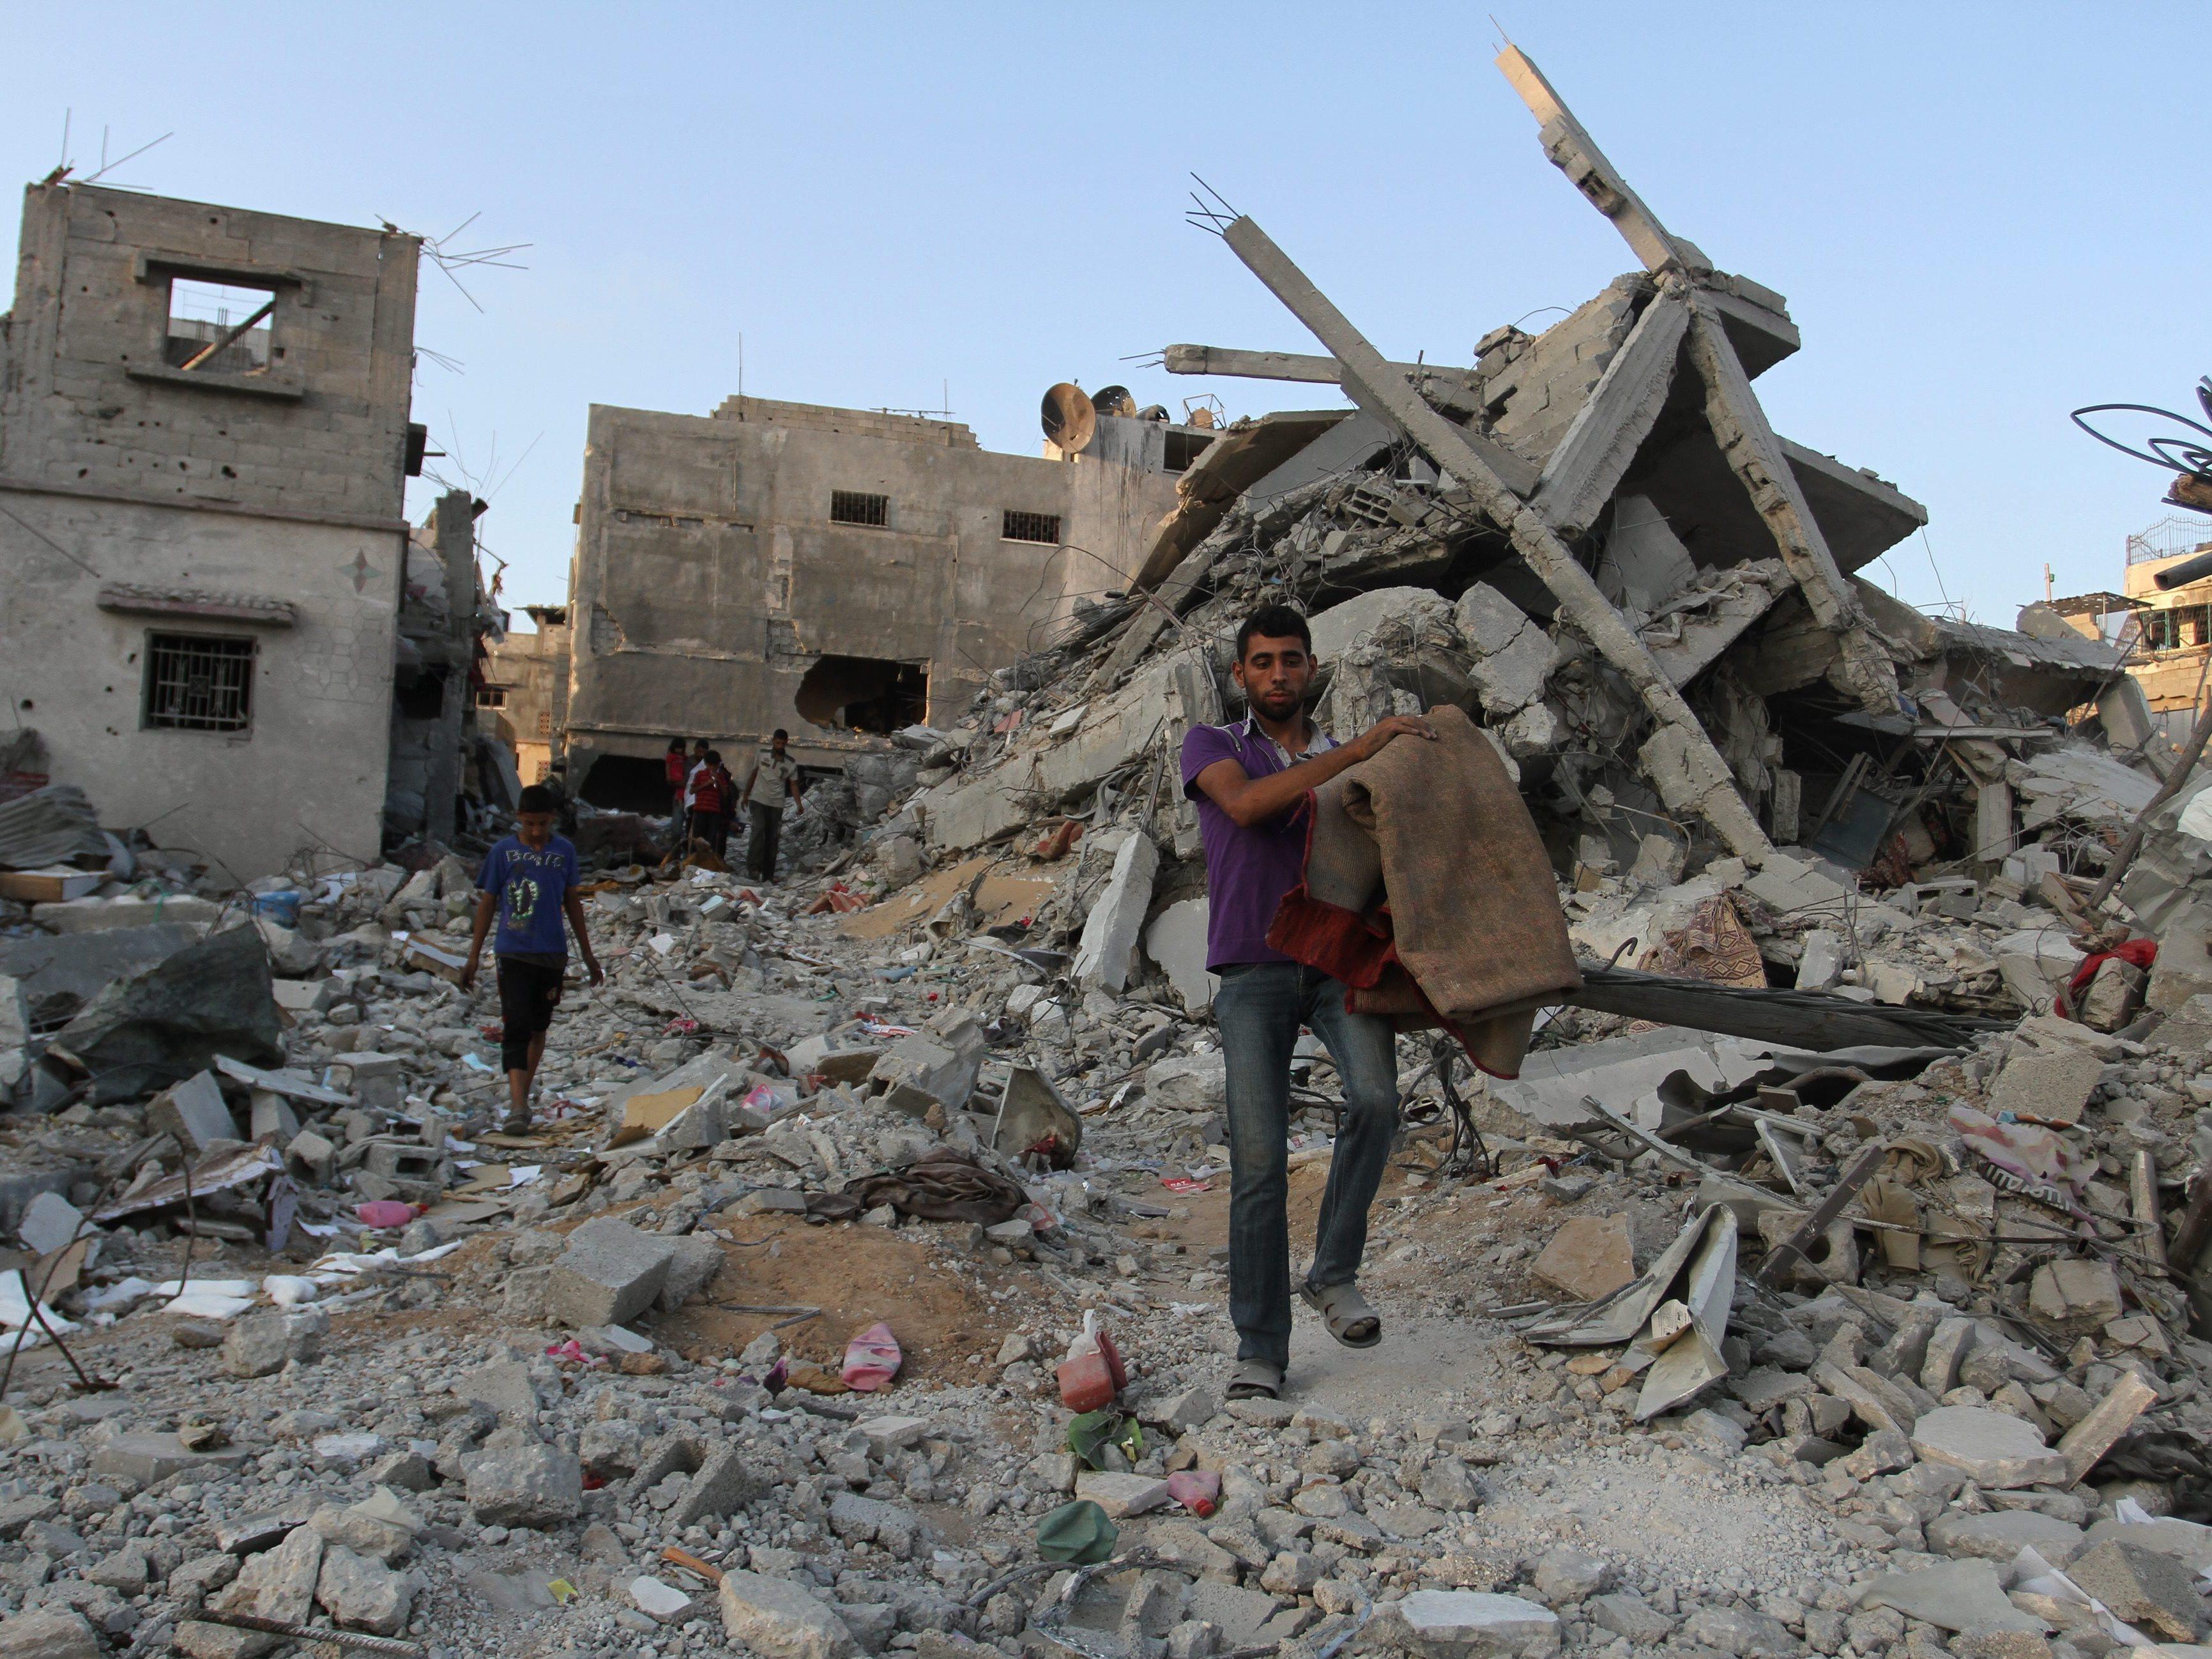 Israel, Palestinians Still Far Apart As Truce Nears End